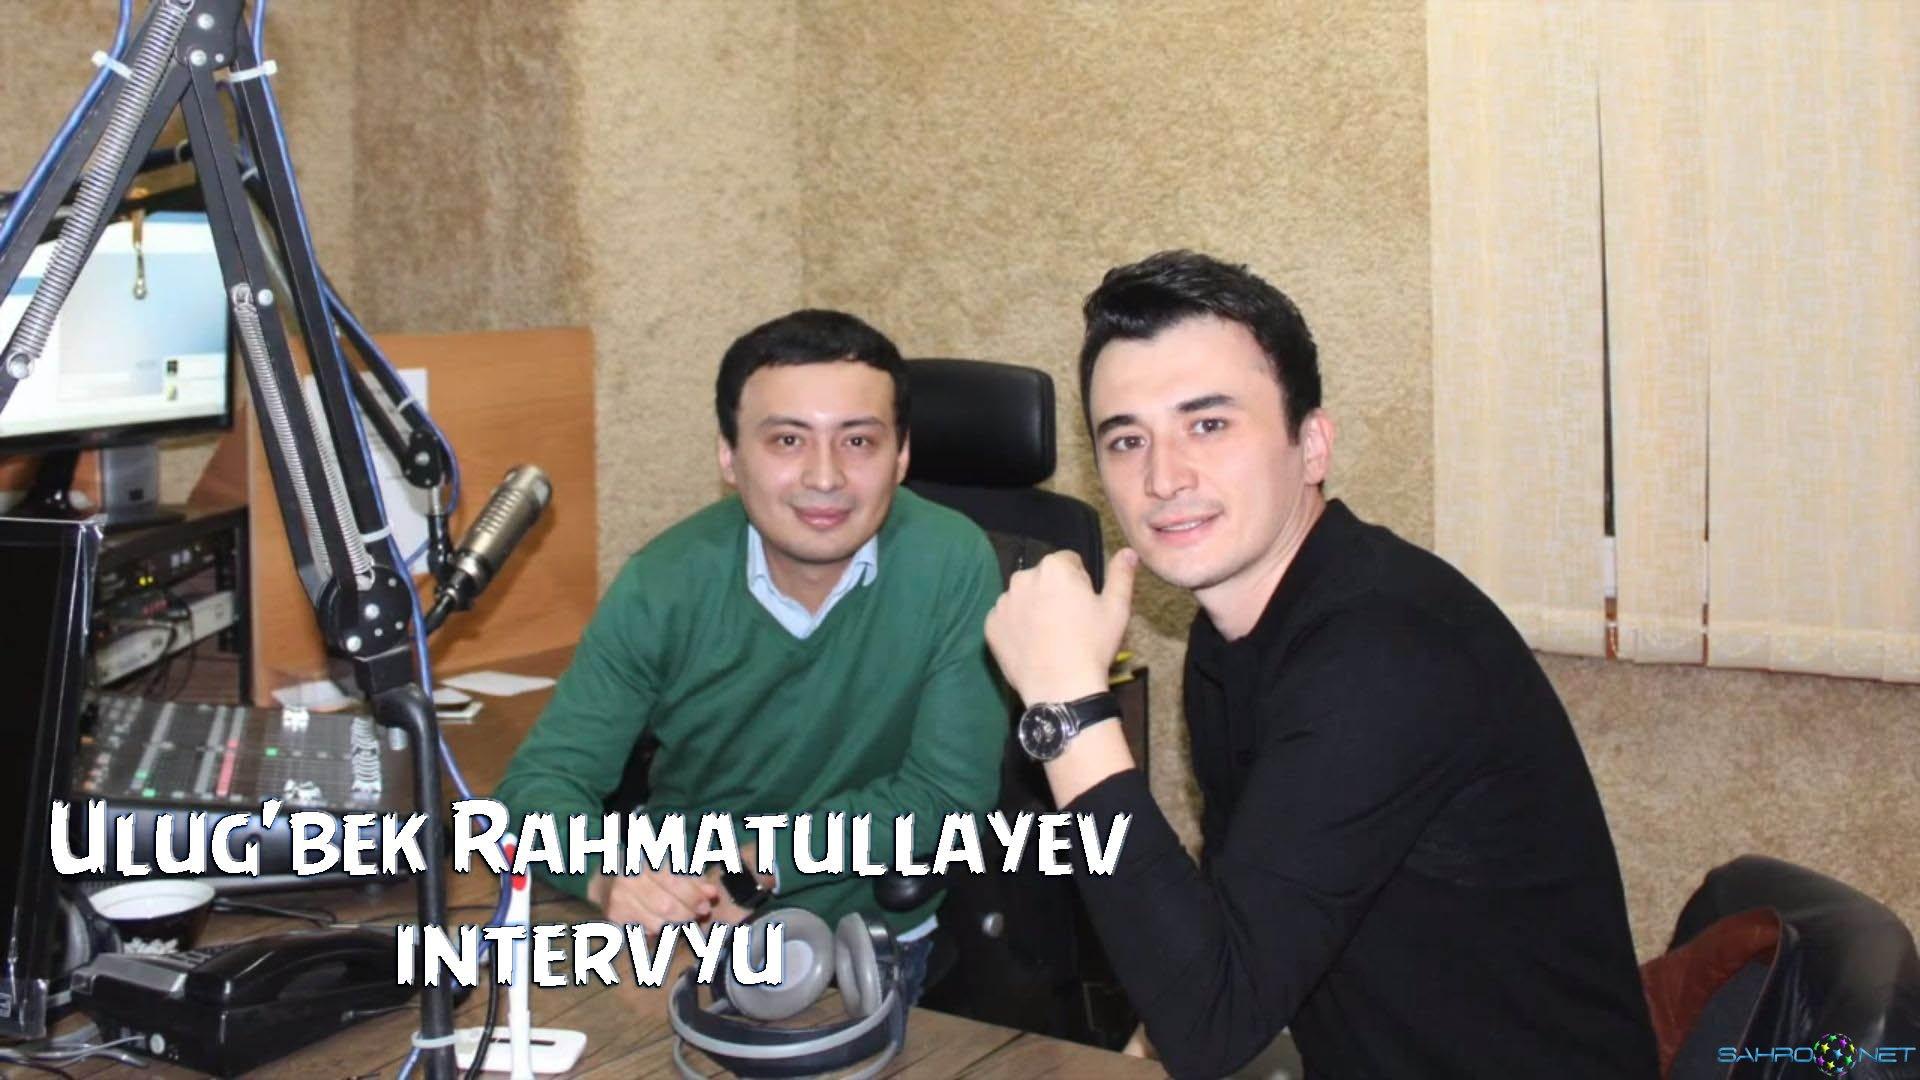 Ulug'bek Rahmatullayev bilan intervyu 2015